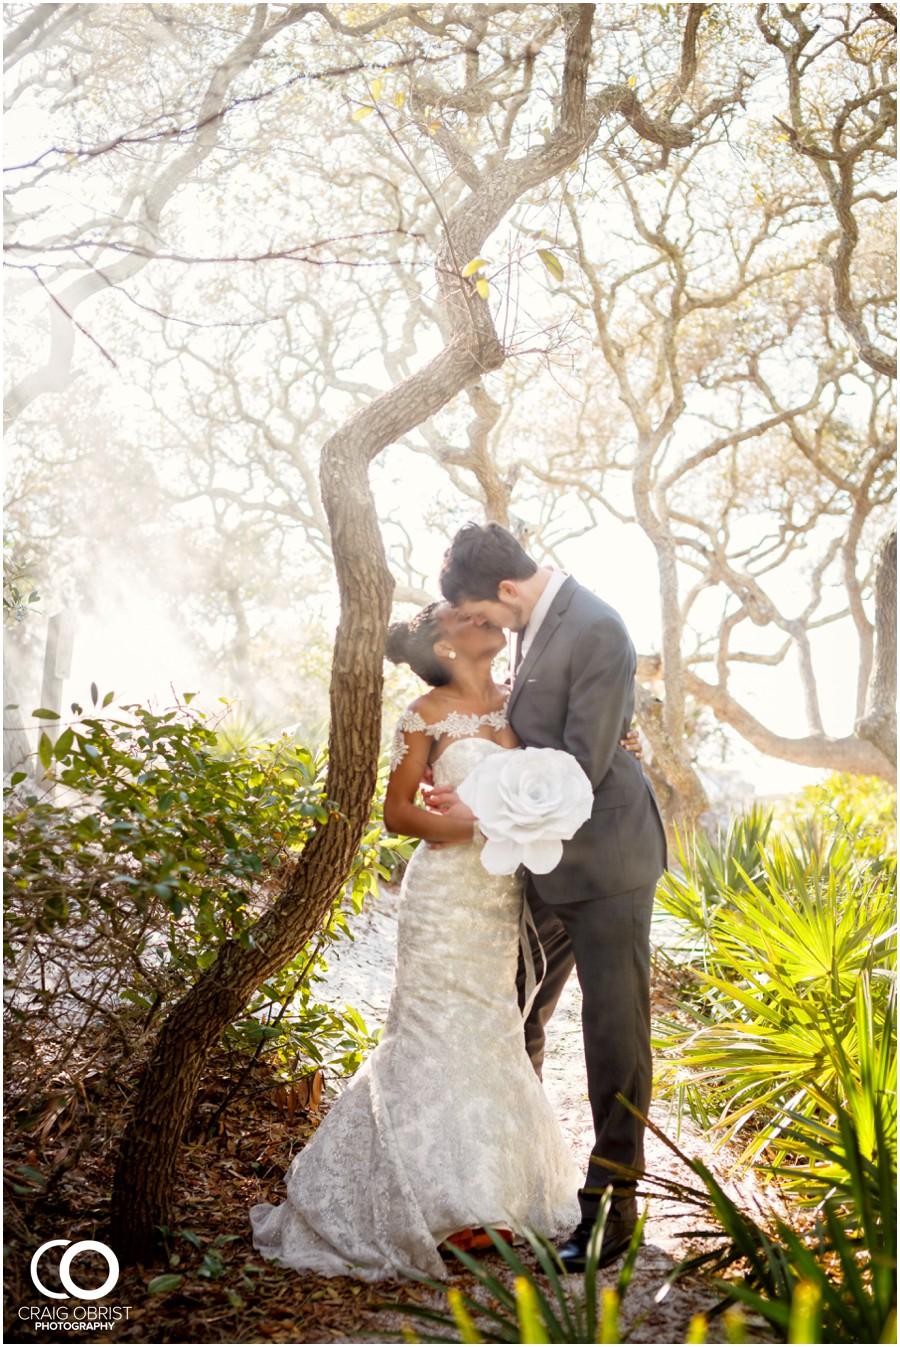 Seaside-30A-Beachside-Wedding-Sunset-Santa-Rosa-Photographer_0064.jpg